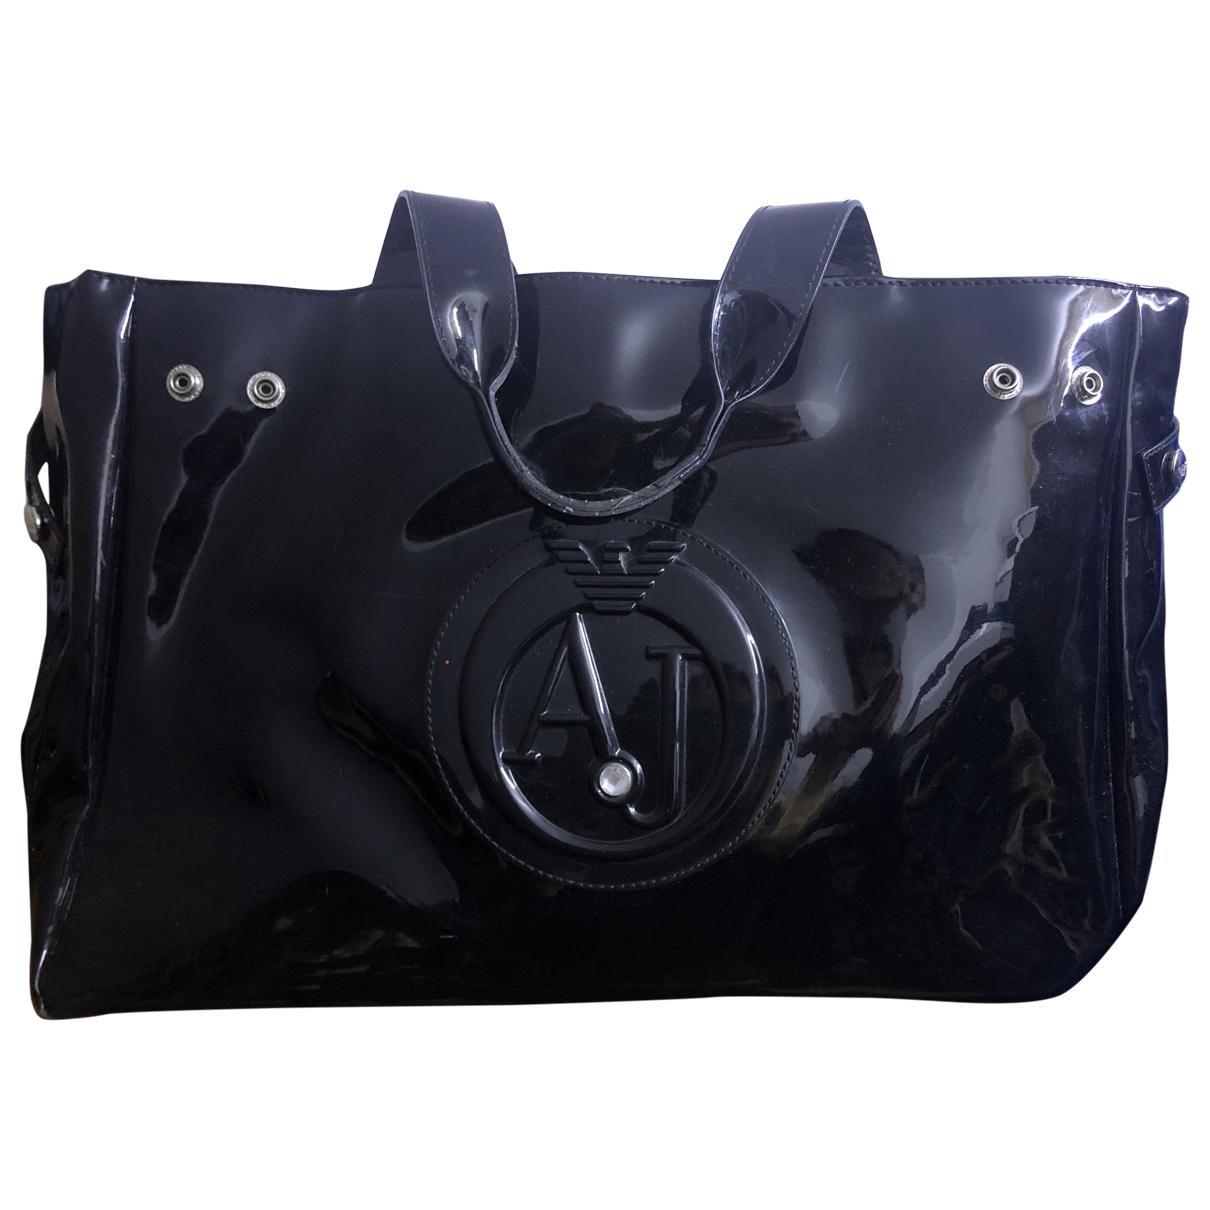 Armani Jeans \N Black Patent leather handbag for Women \N